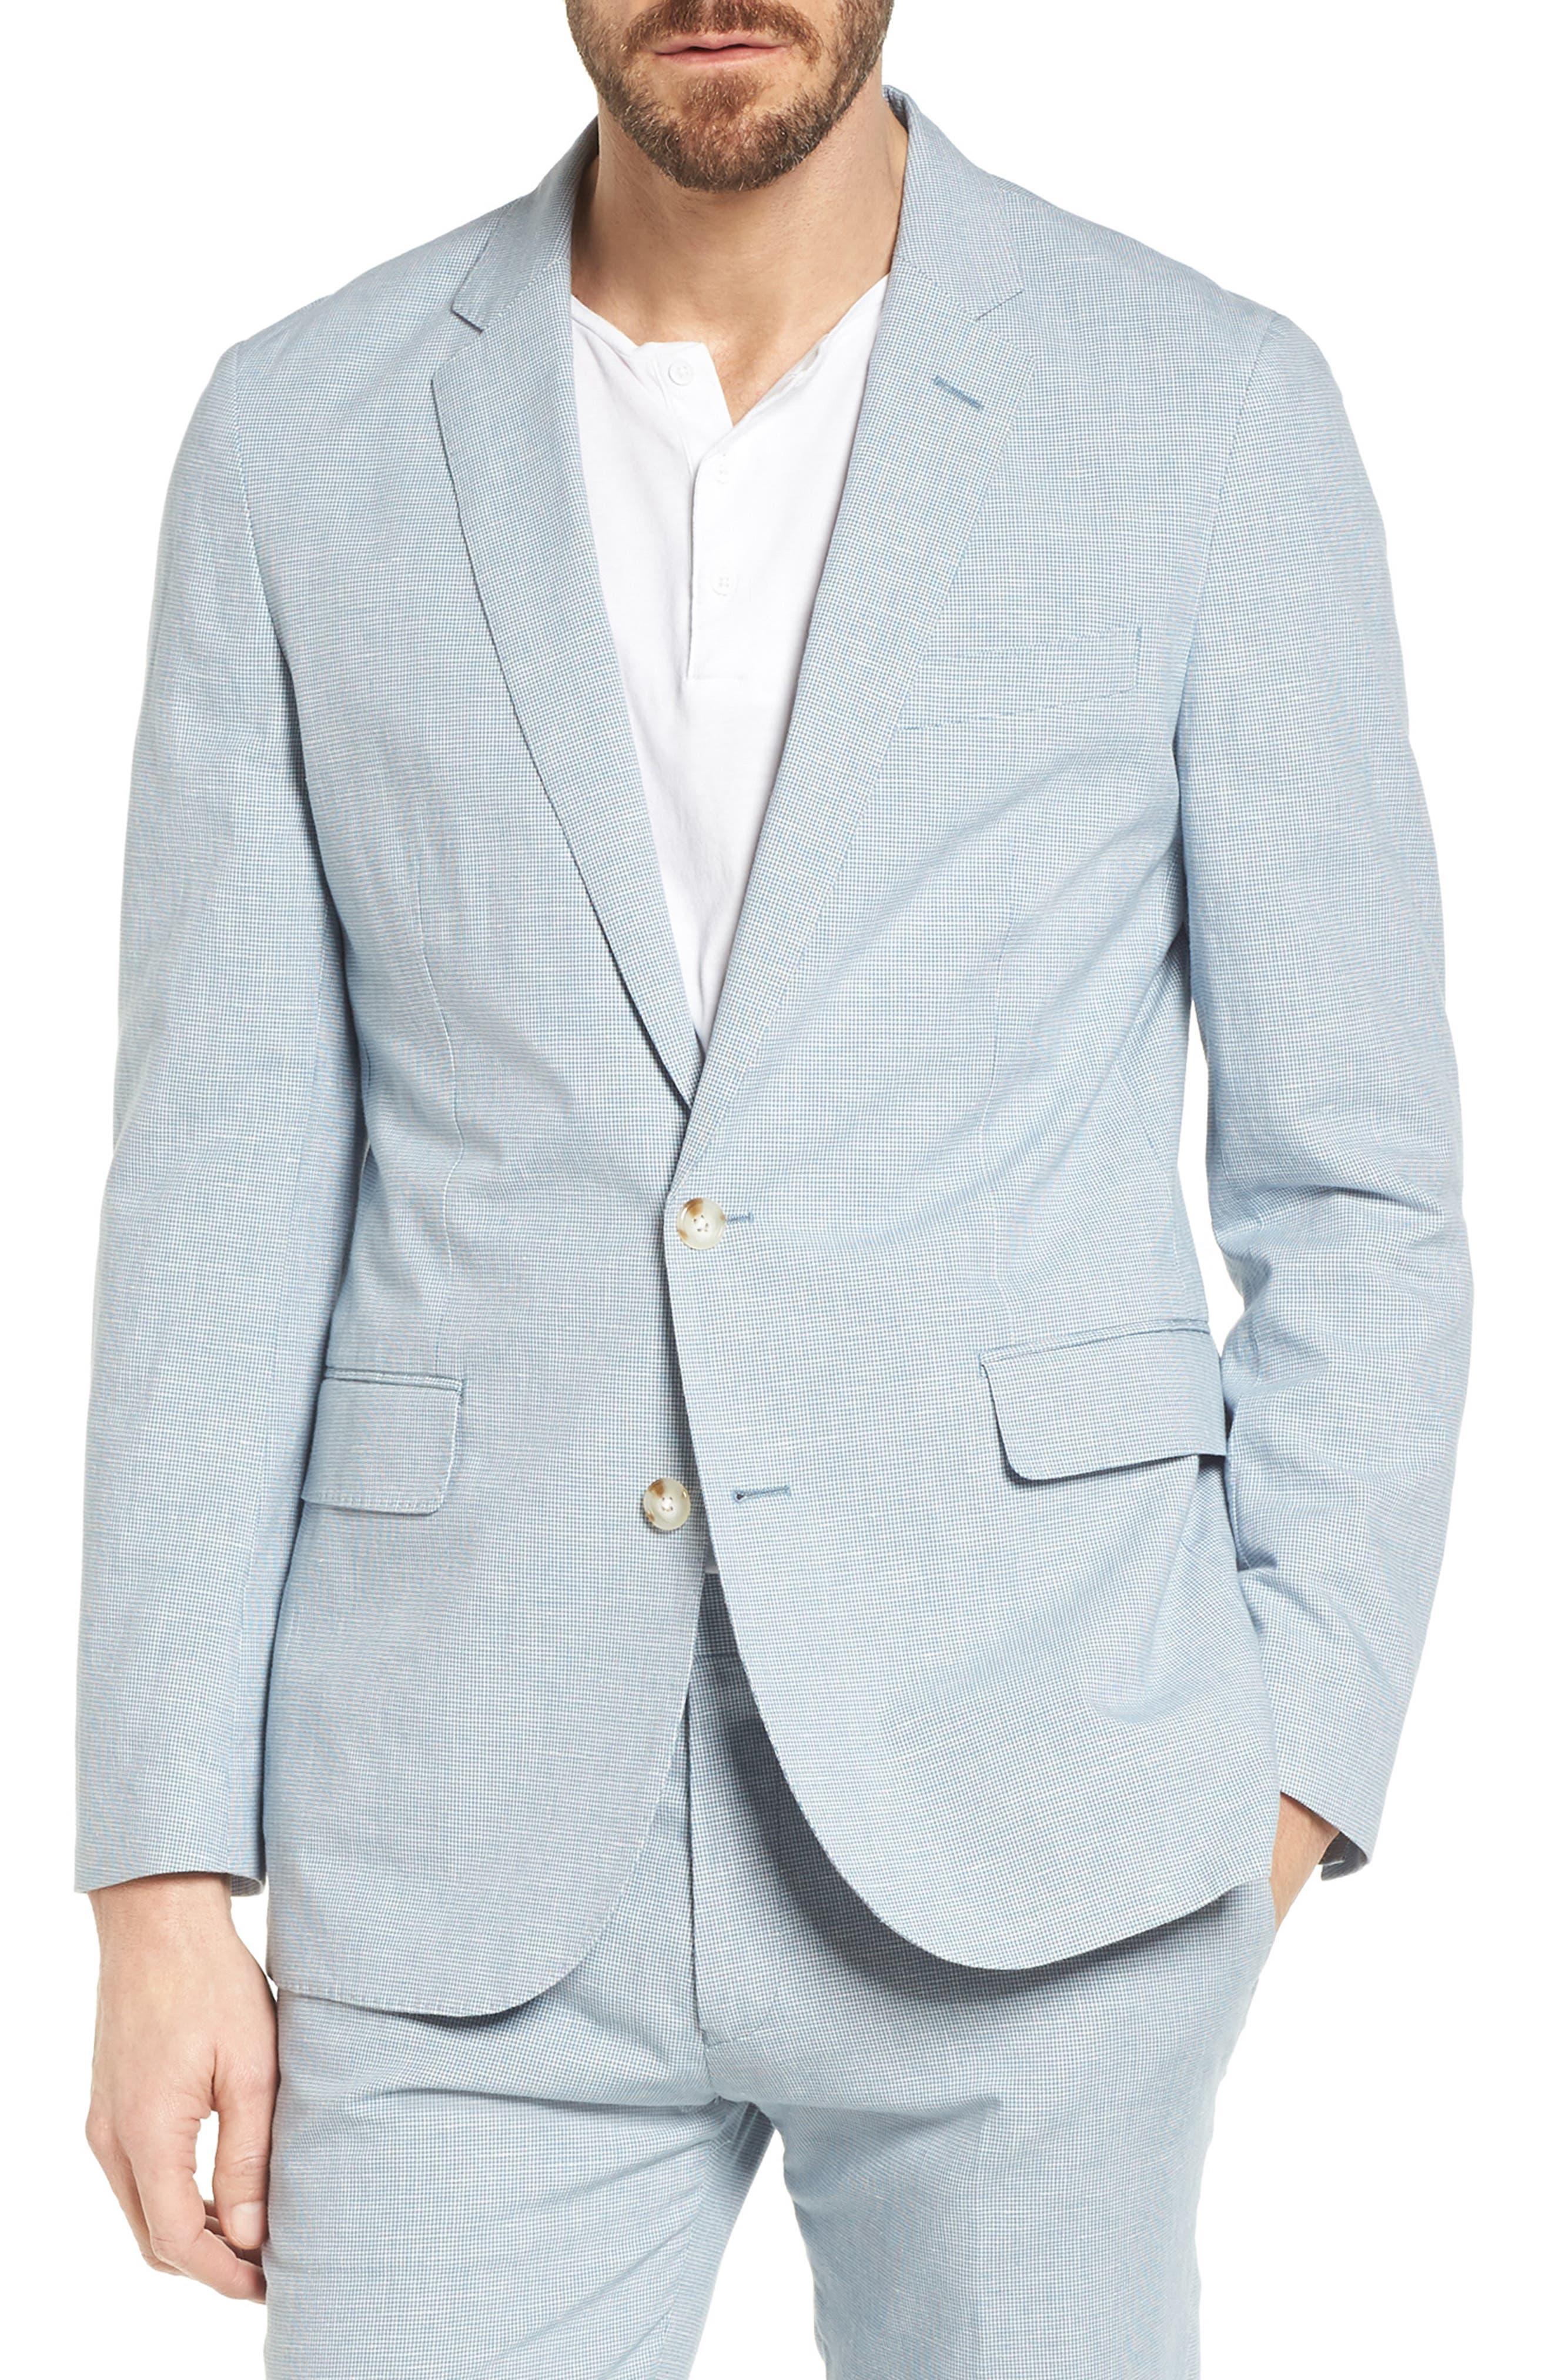 Ludlow Houndstooth Cotton & Linen Sport Coat,                         Main,                         color, Light Blue